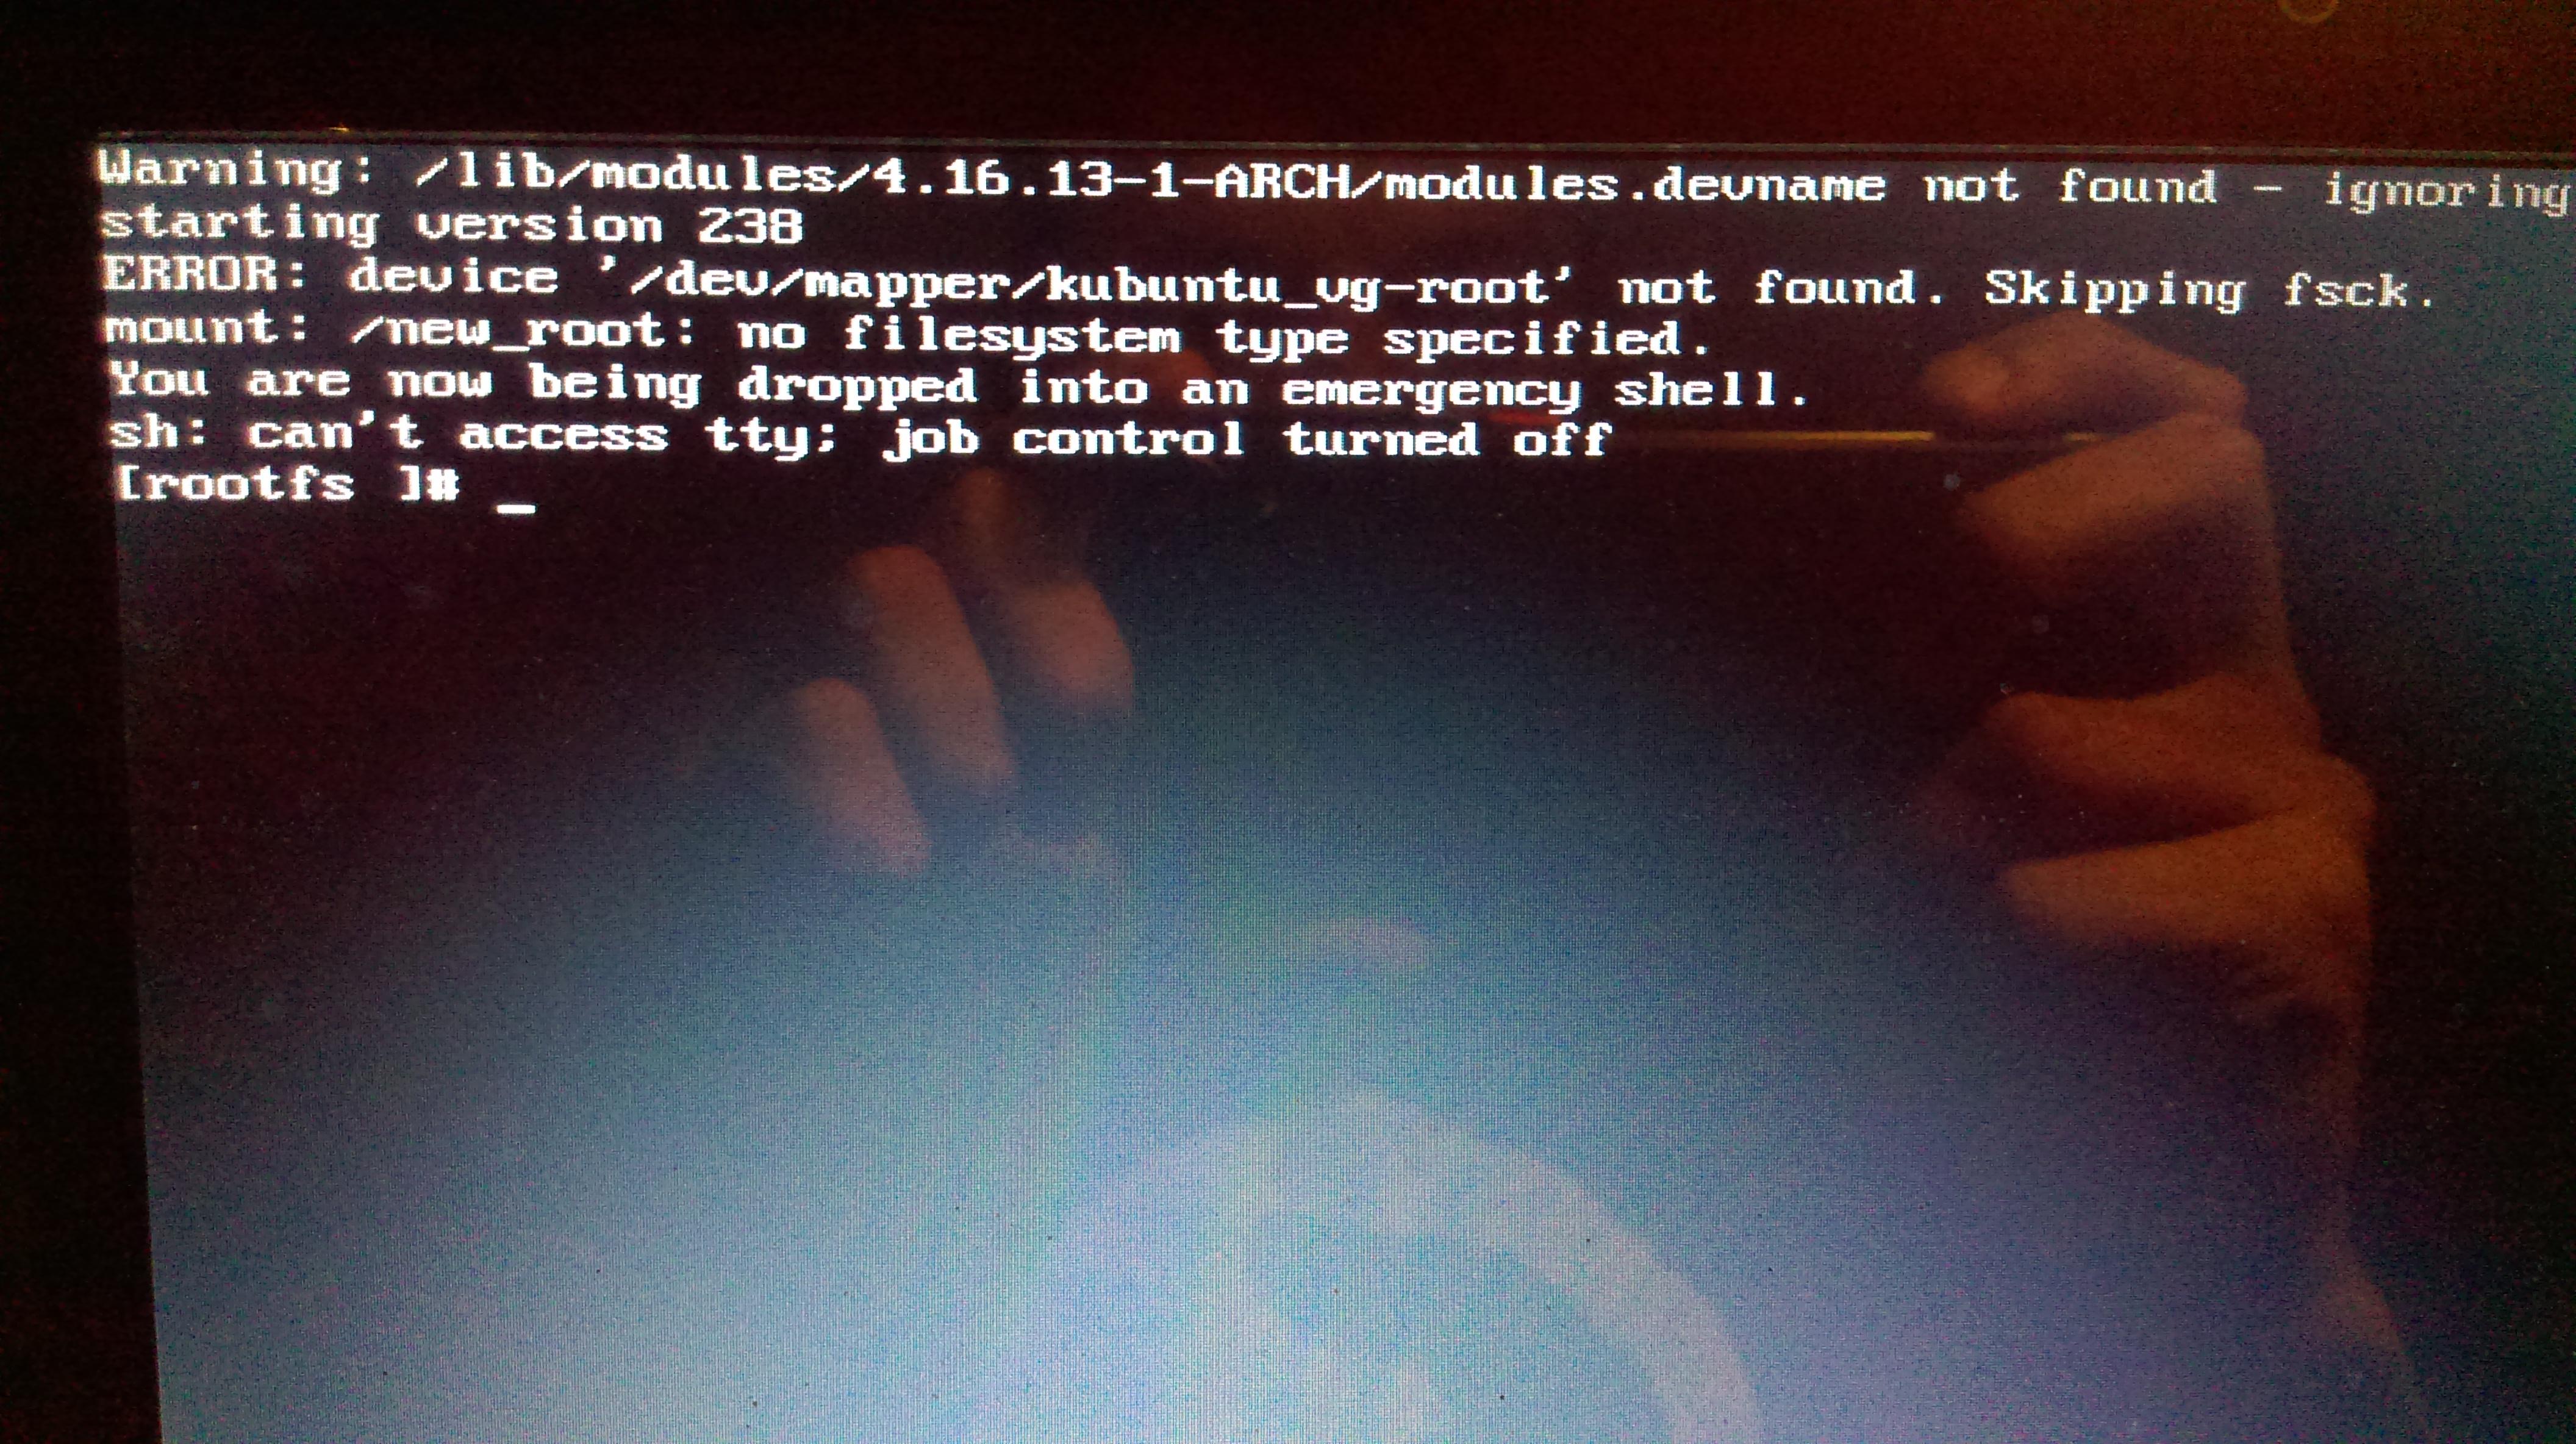 Linux: /lib/modules/4 16 13-1-ARCH/modules devname not found